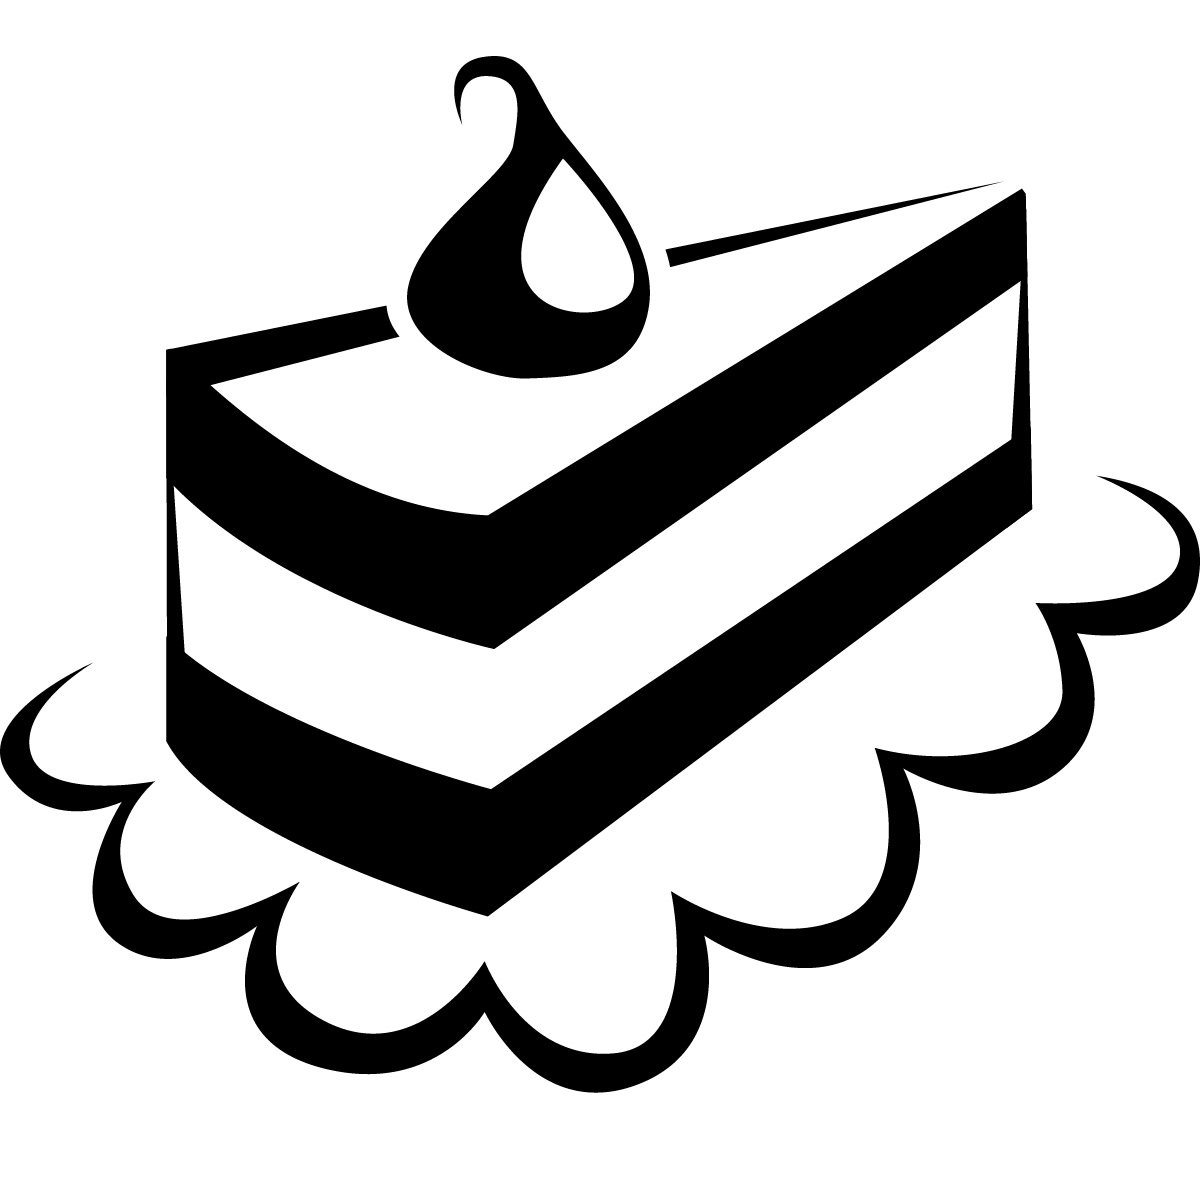 Cake slice clipart black and white 9 » Clipart Station  |Cake Slice Clipart Black And White